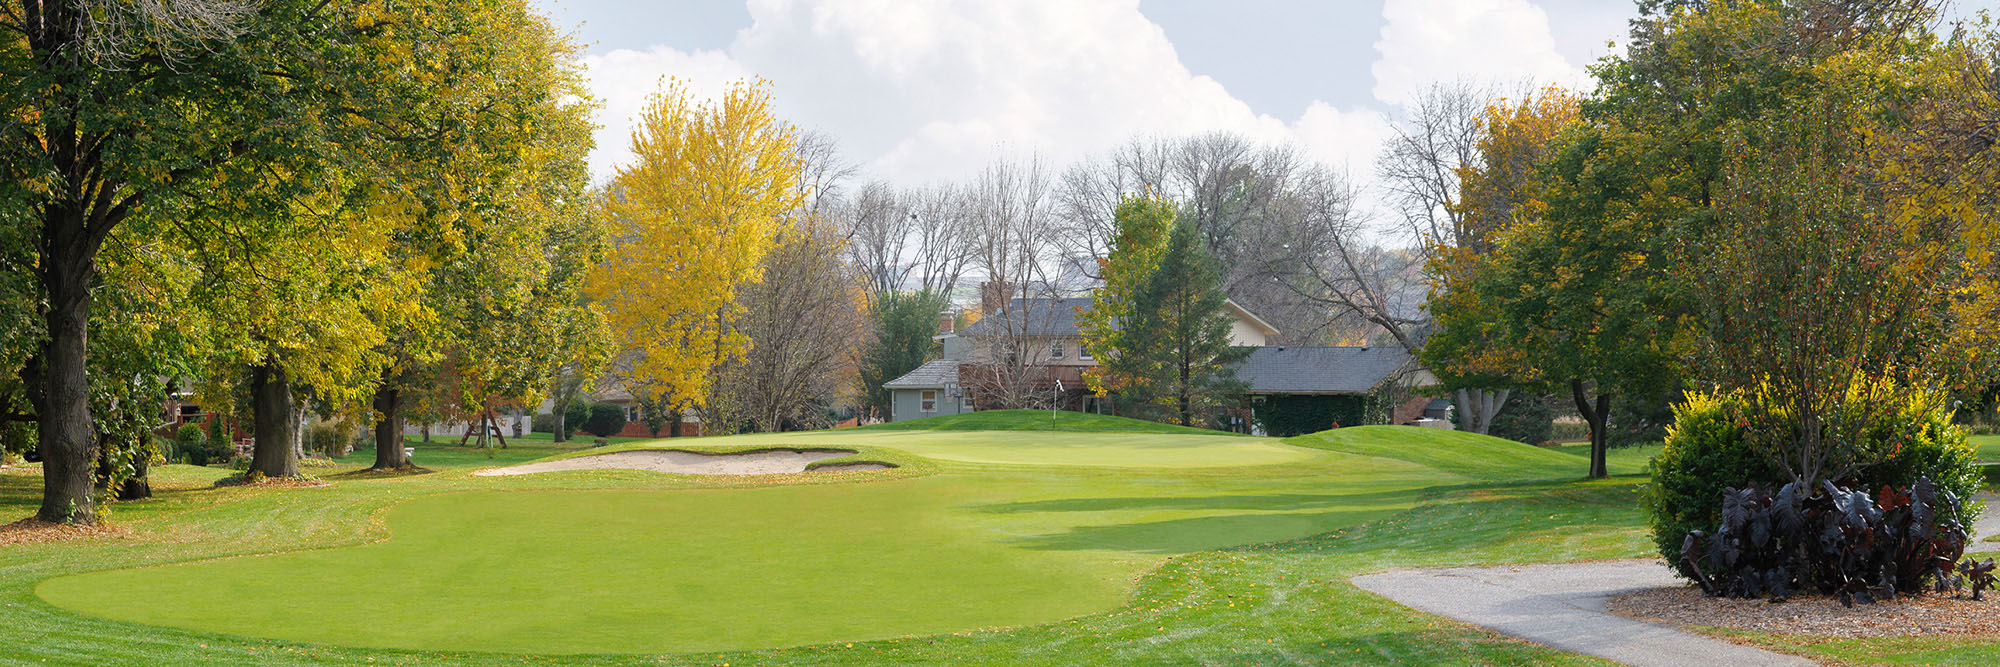 Golf Course Image - Oak Hill No. 15